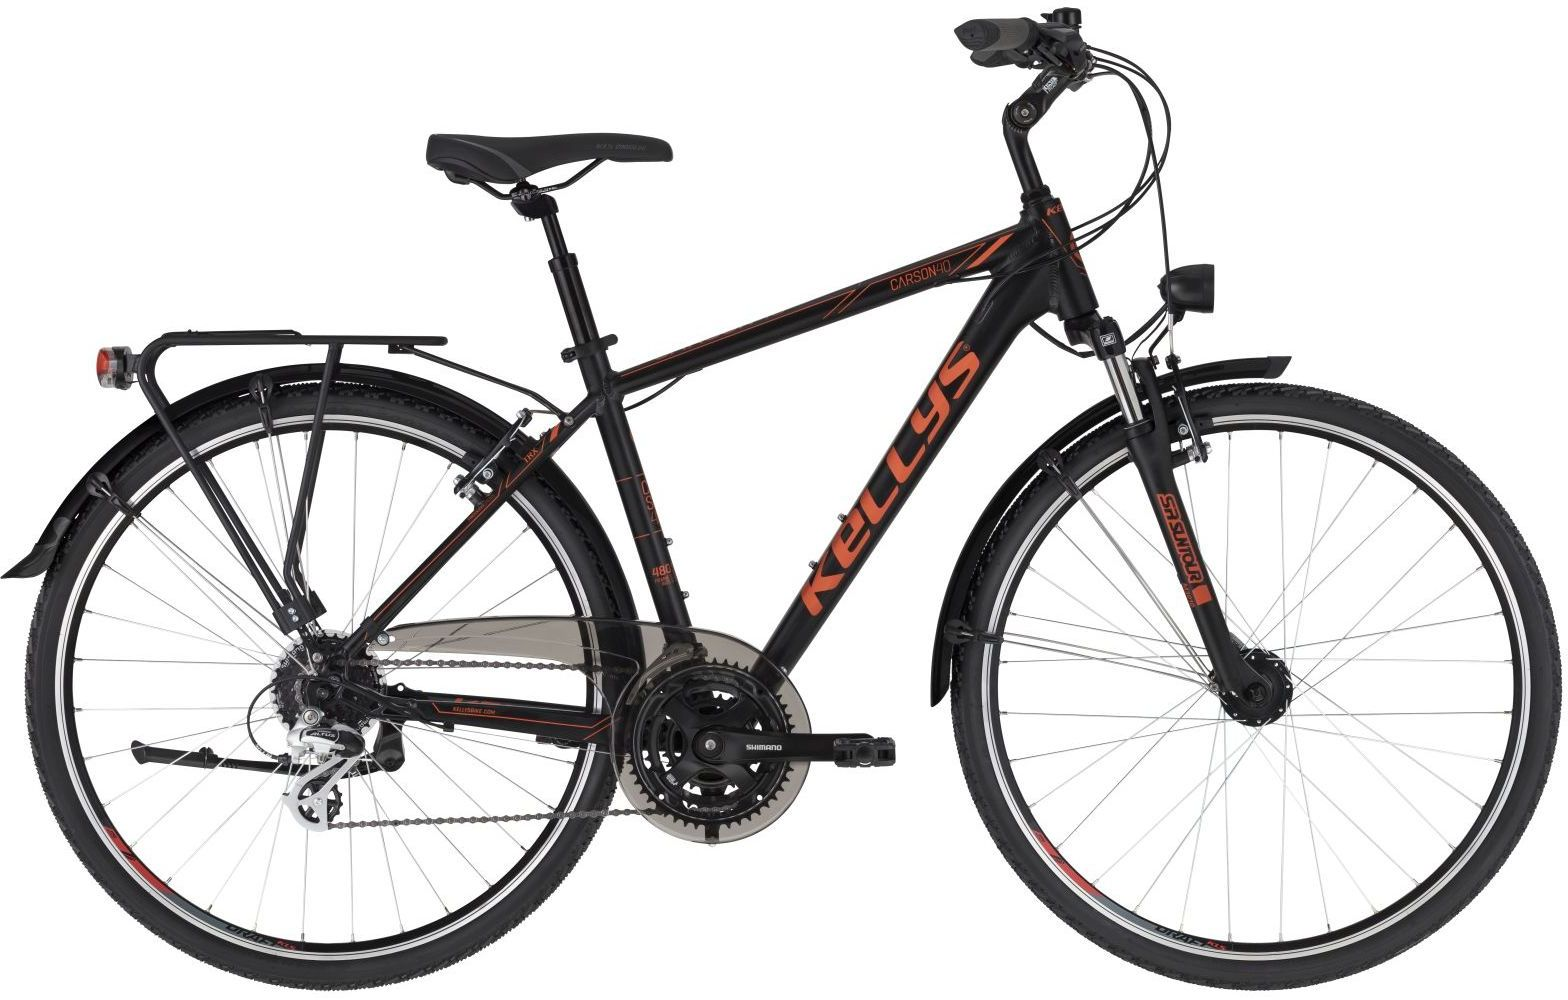 Rower Kellys CARSON 40 28 2020